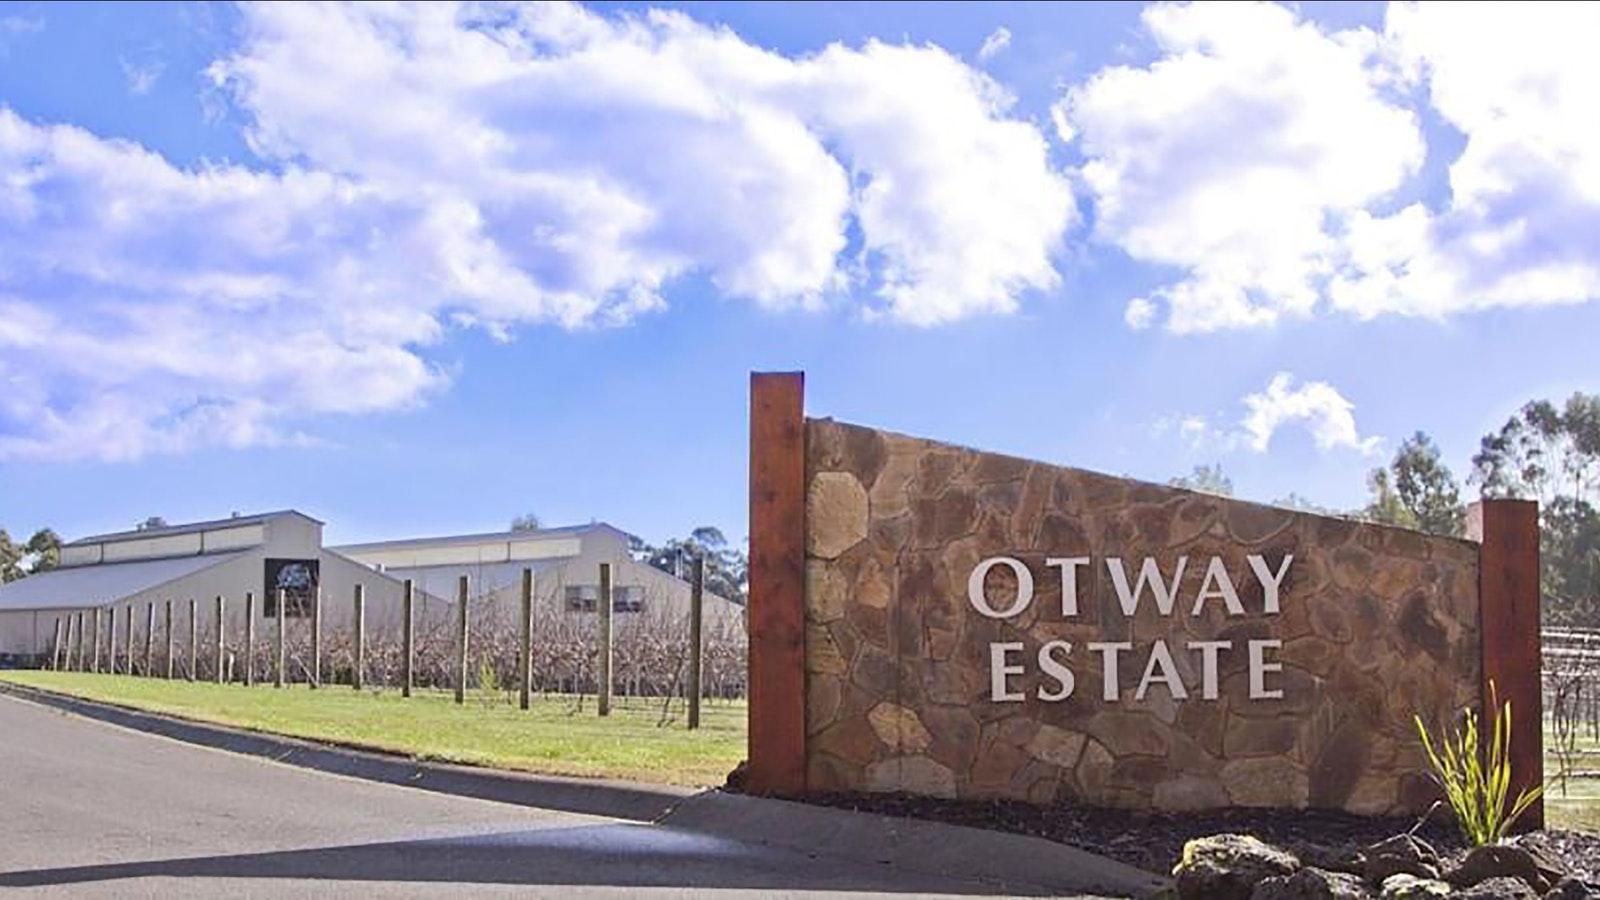 Otway Estate Winery & Brewery